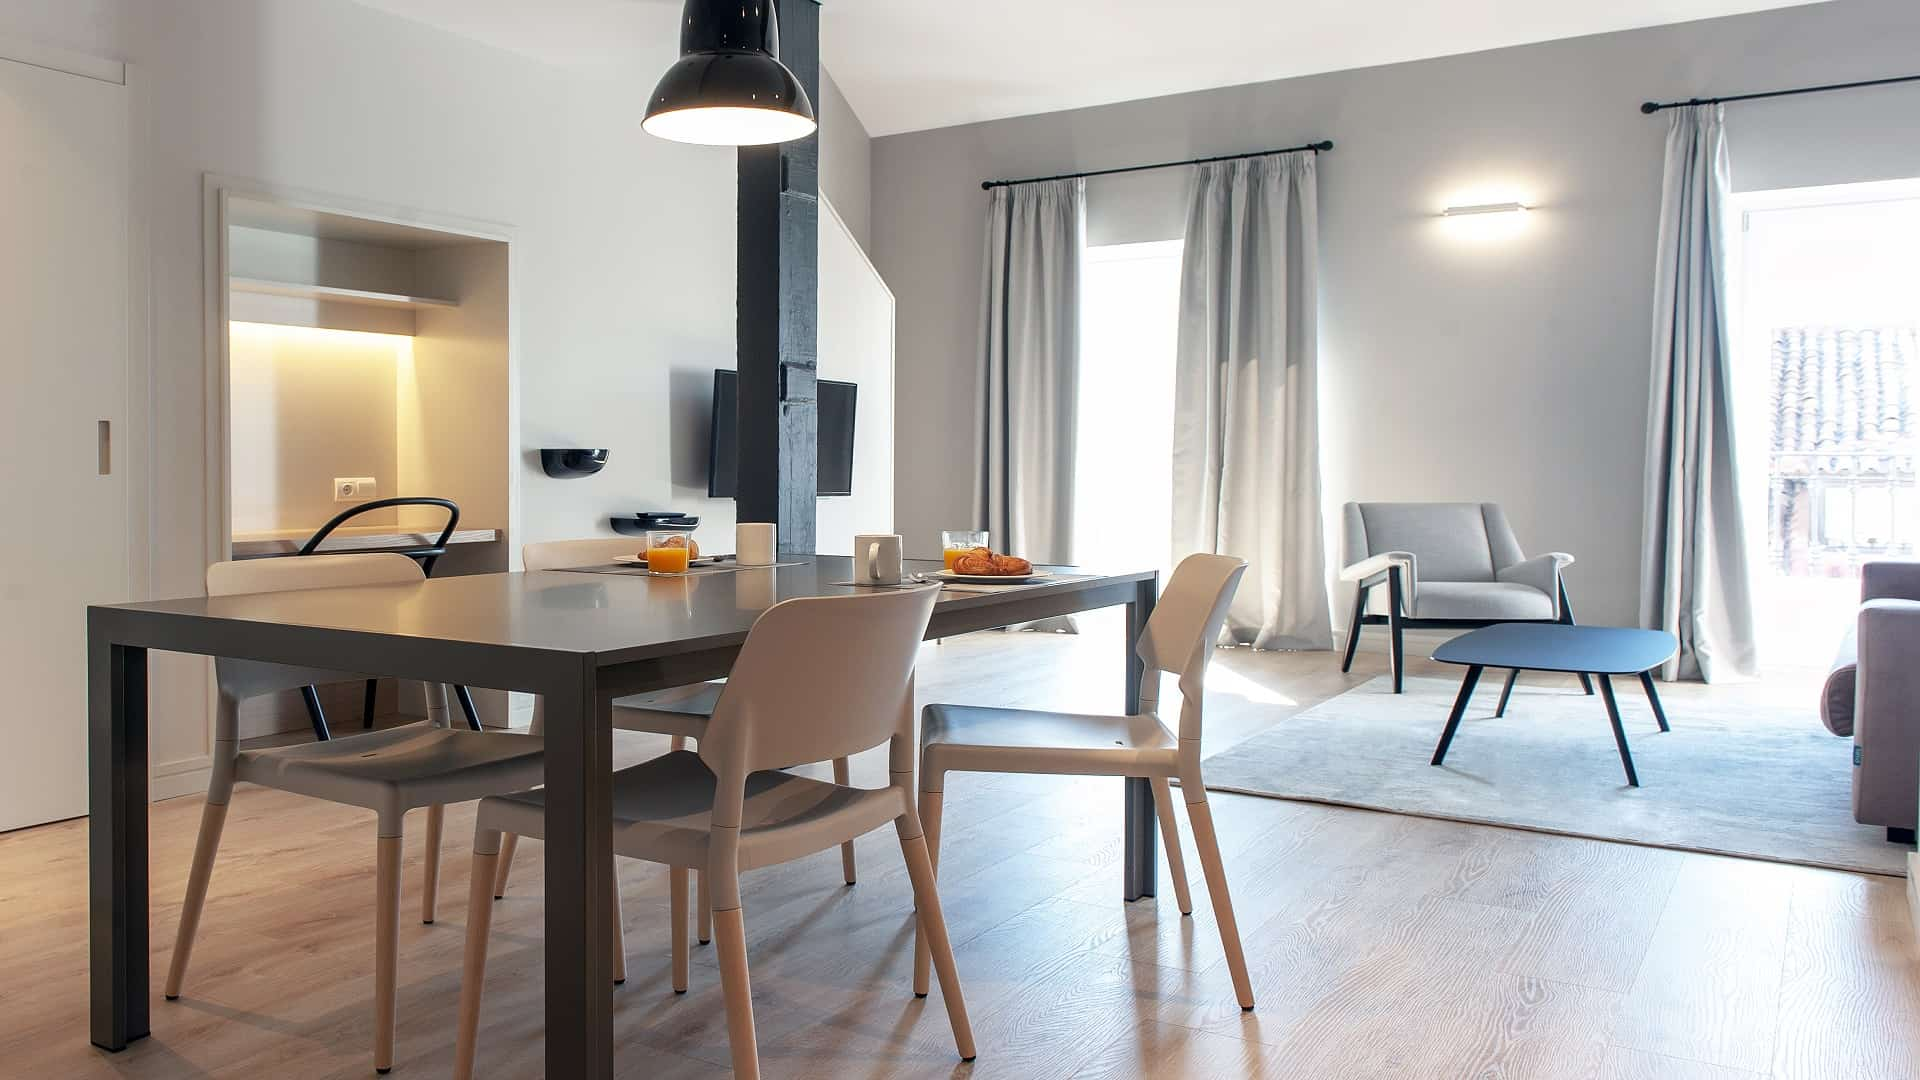 MH Apartments<br> diferente estilo, misma esencia